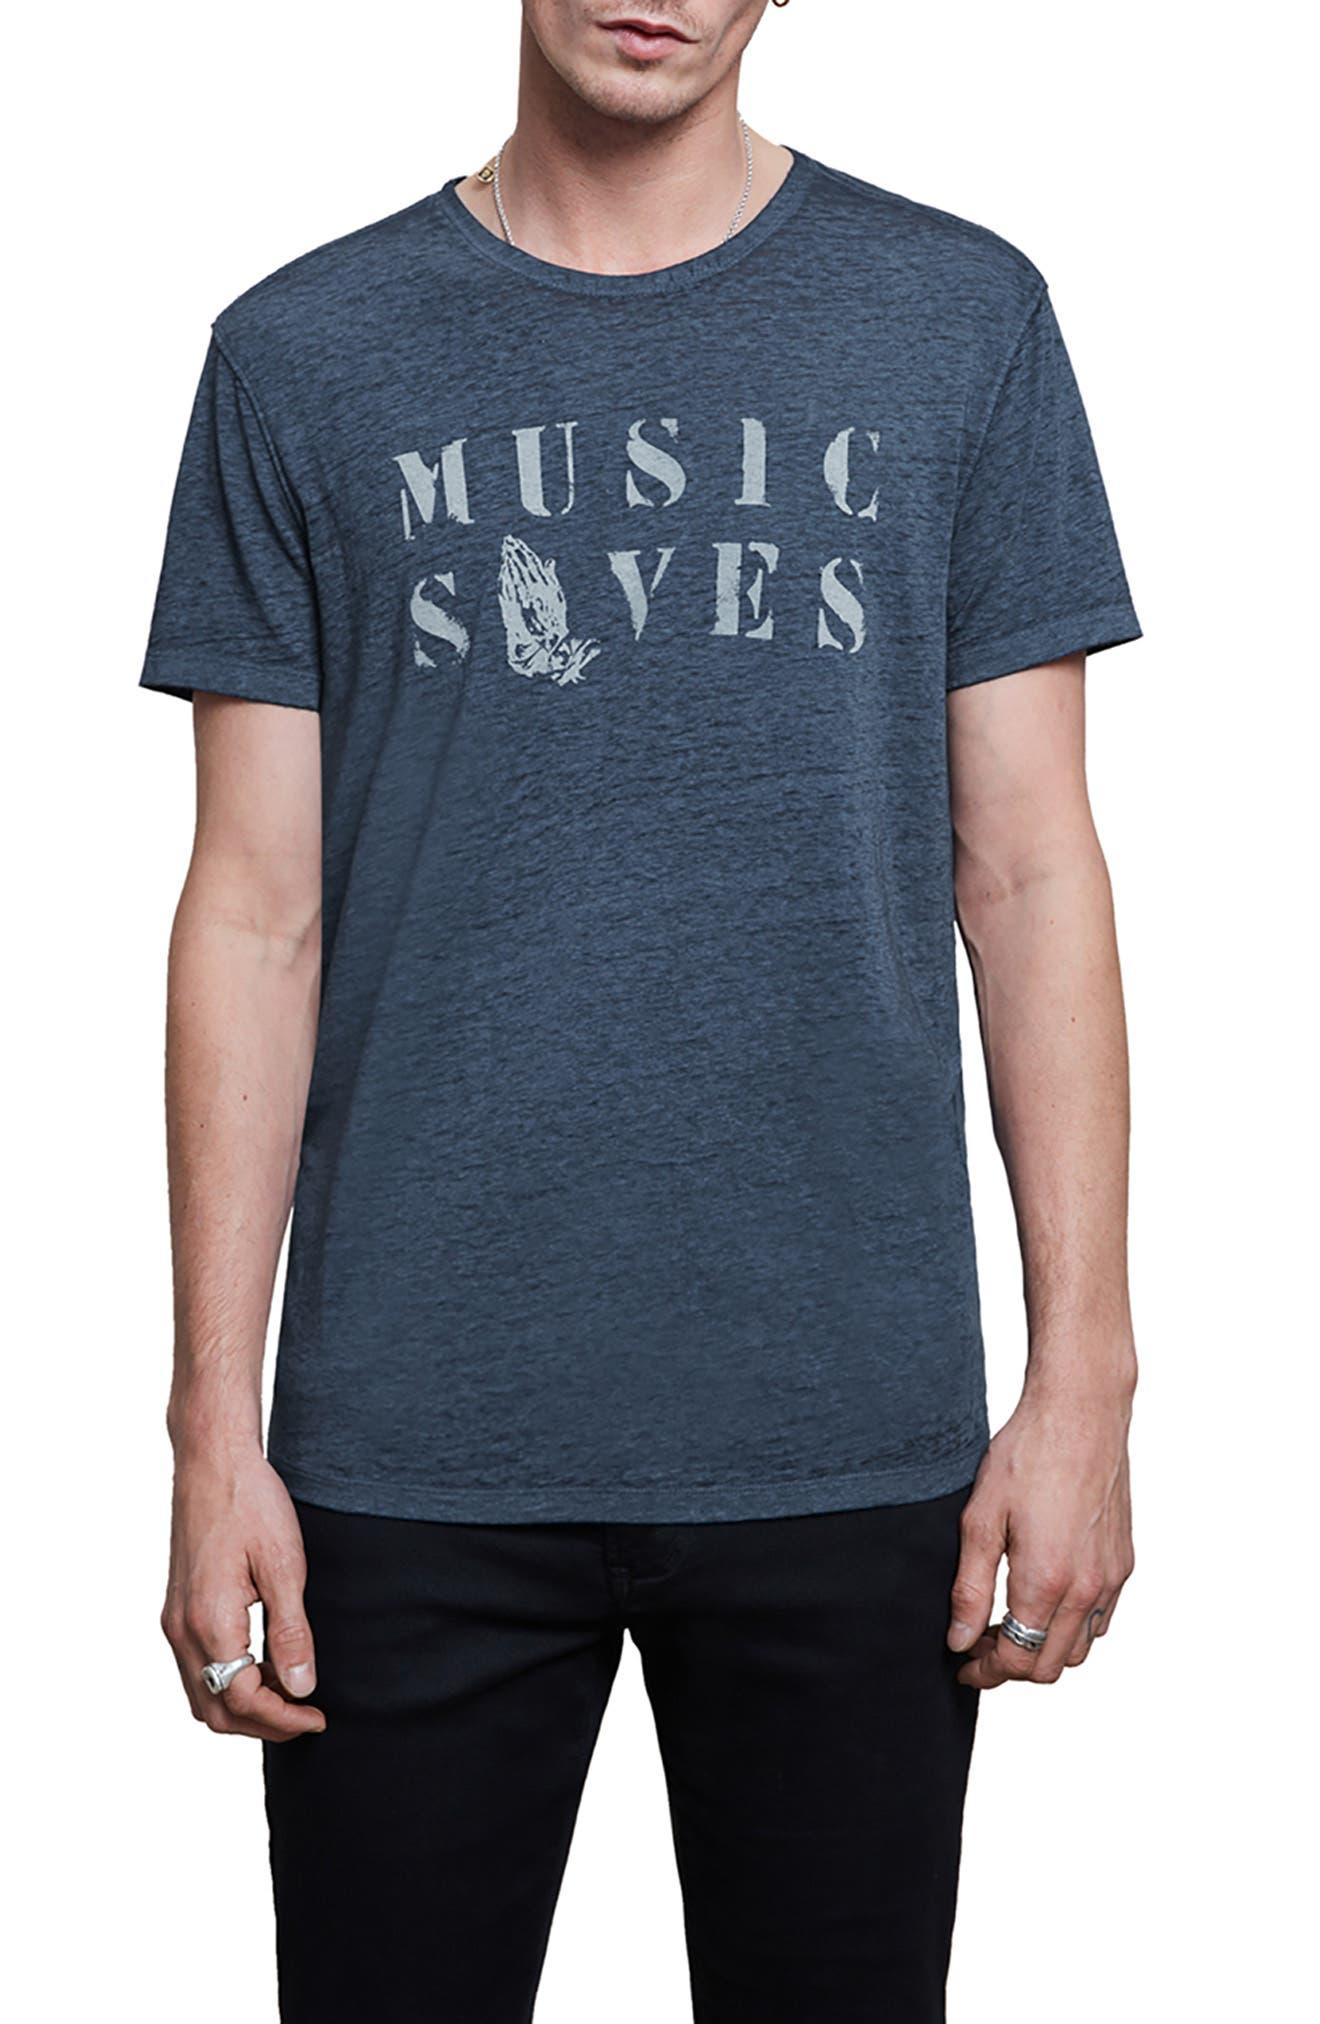 John Varvatos Men's John Varvatos Music Saves Graphic Tee, Size X-Large - Blue